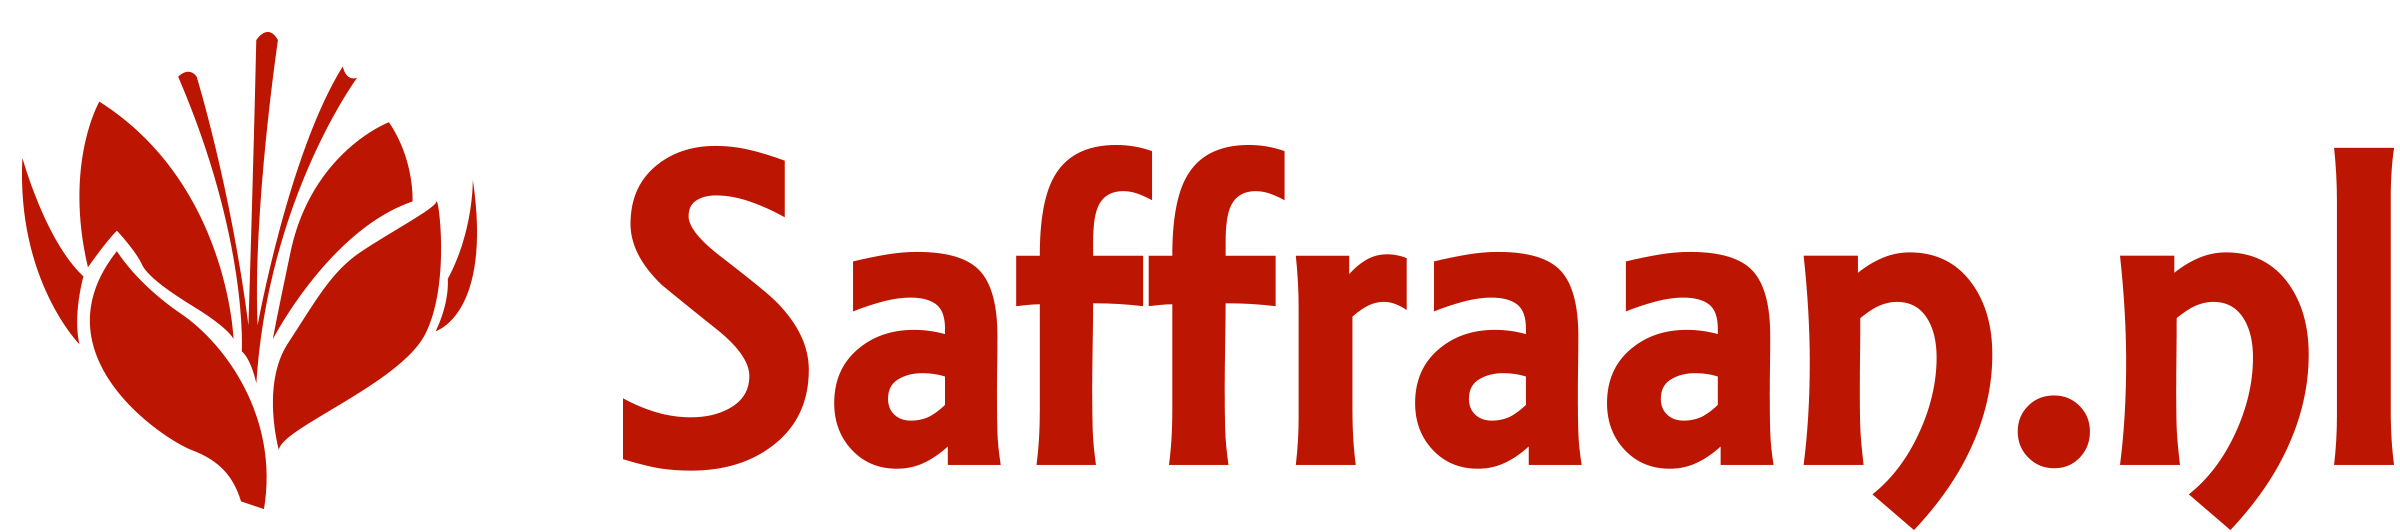 Saffraan.nl